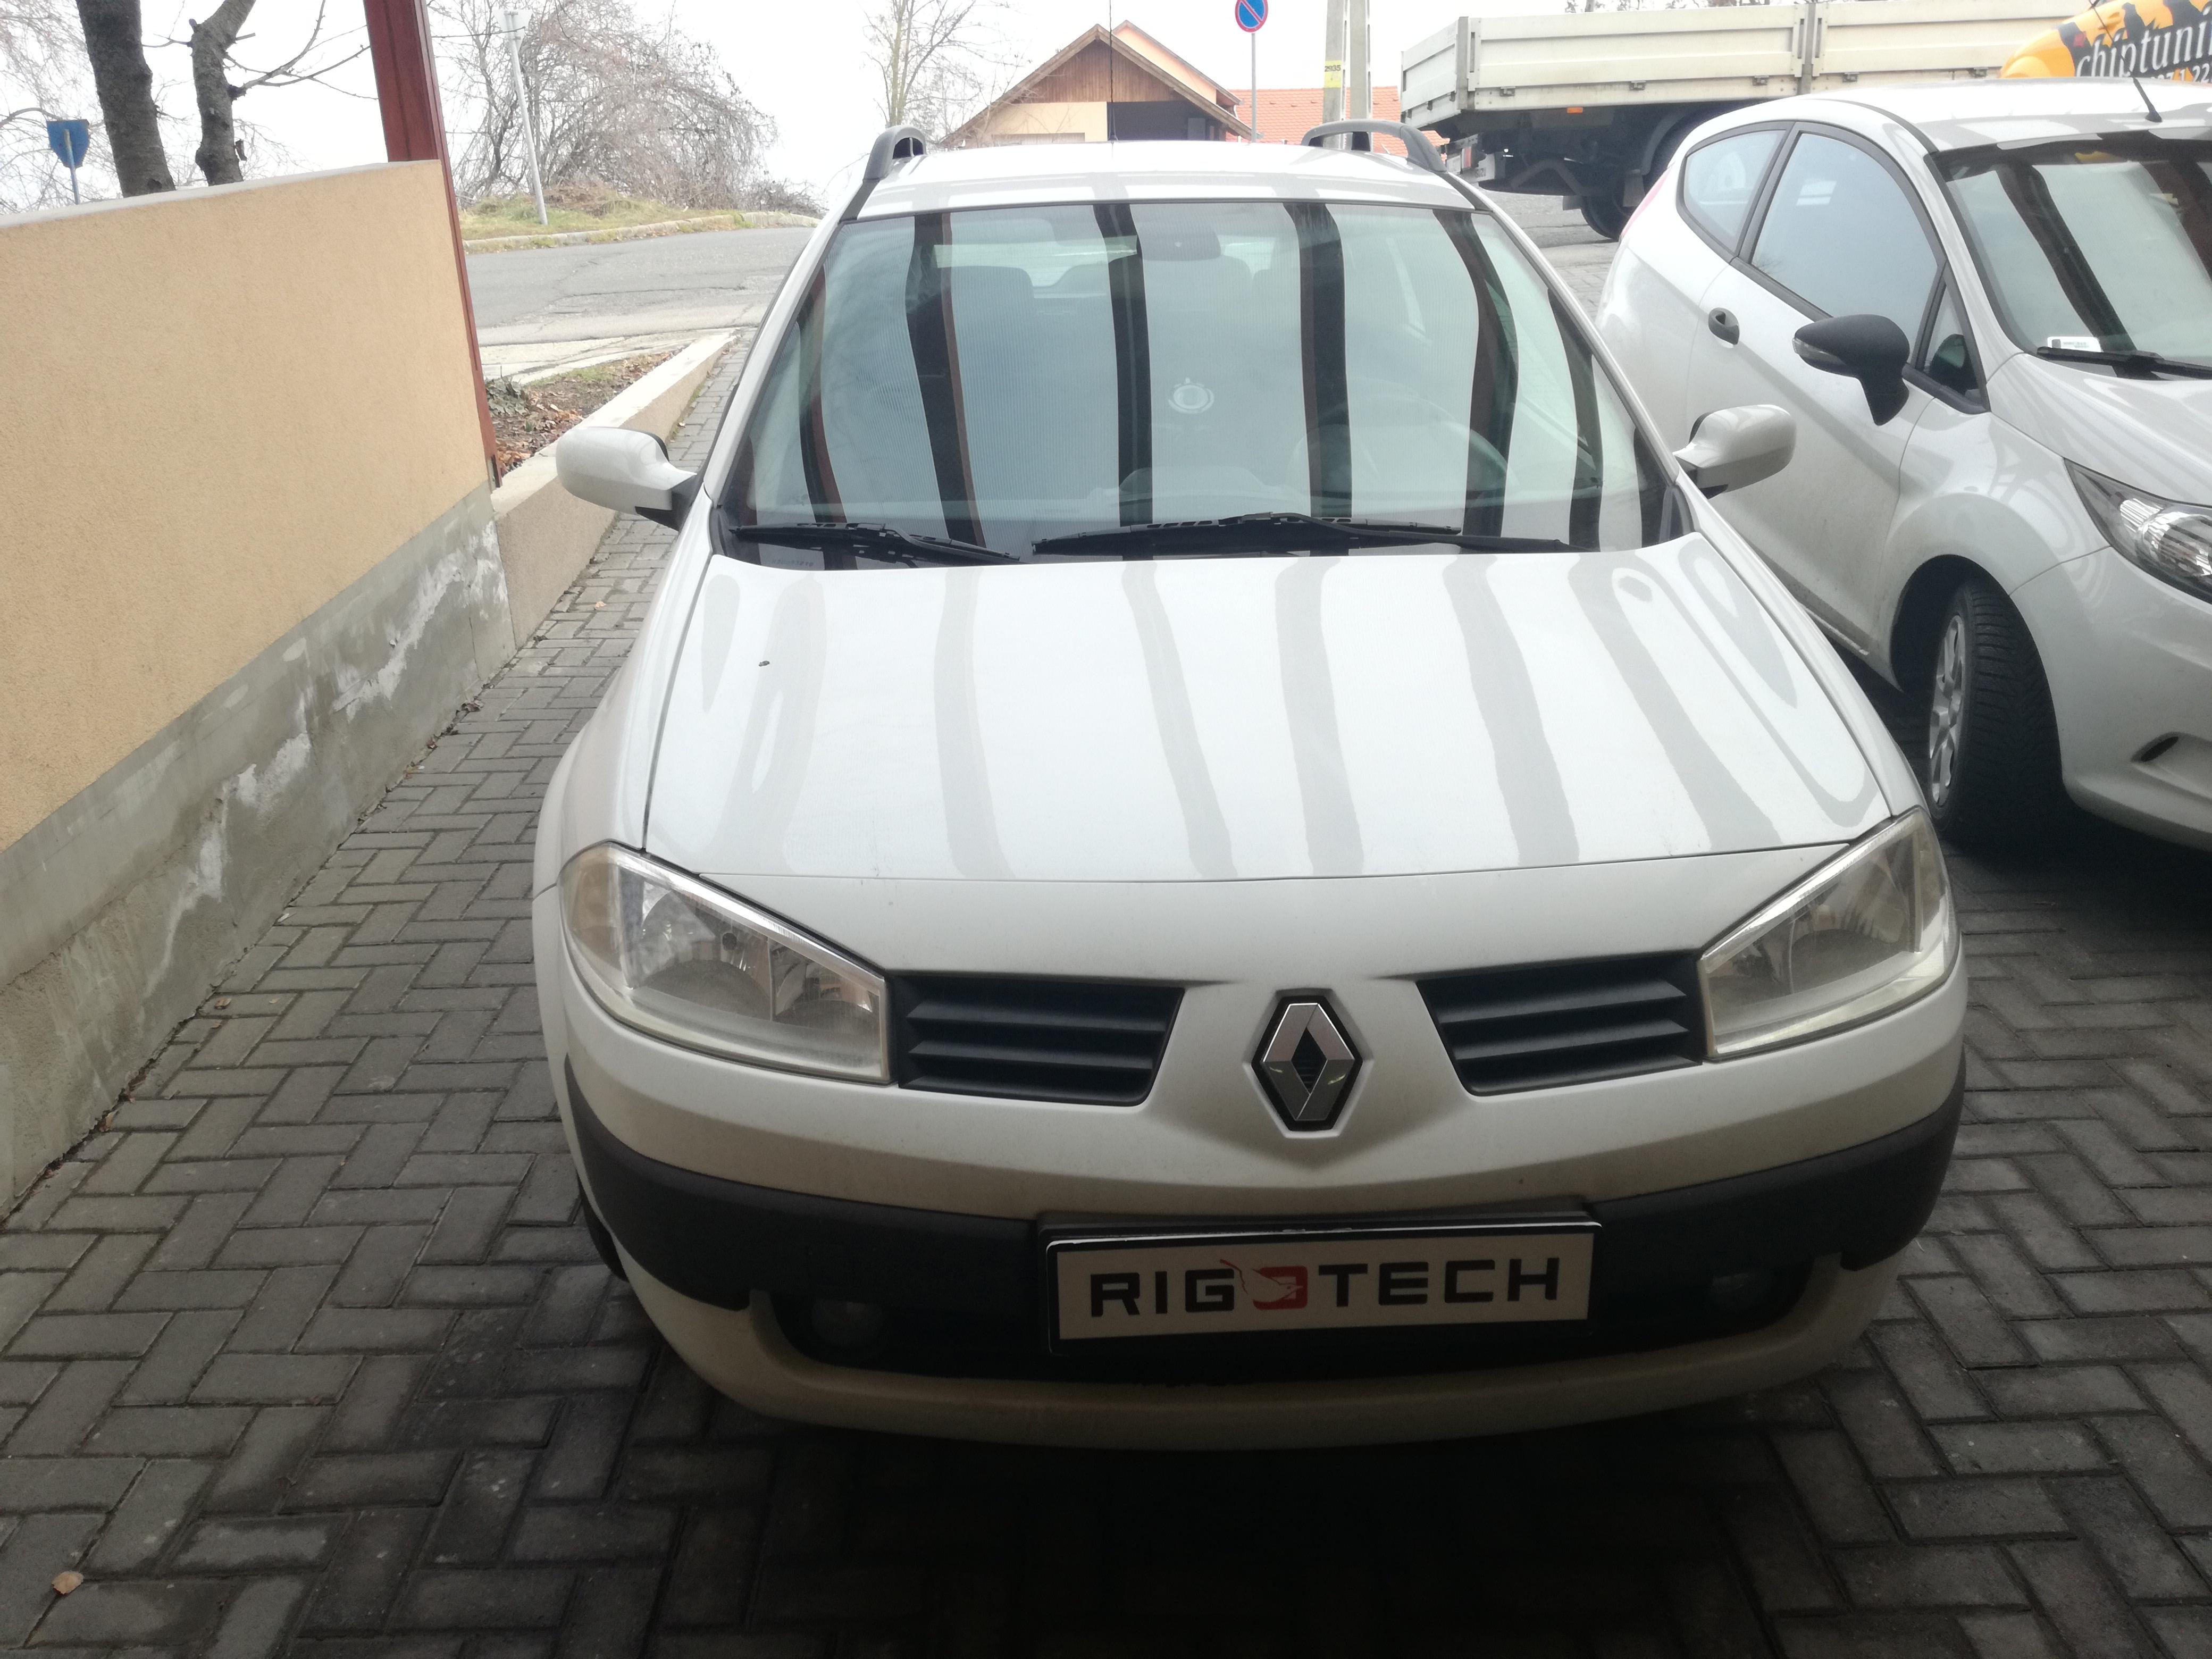 Renault-Megane-ii-2002tul-16i-112ps-2003-Chiptuning